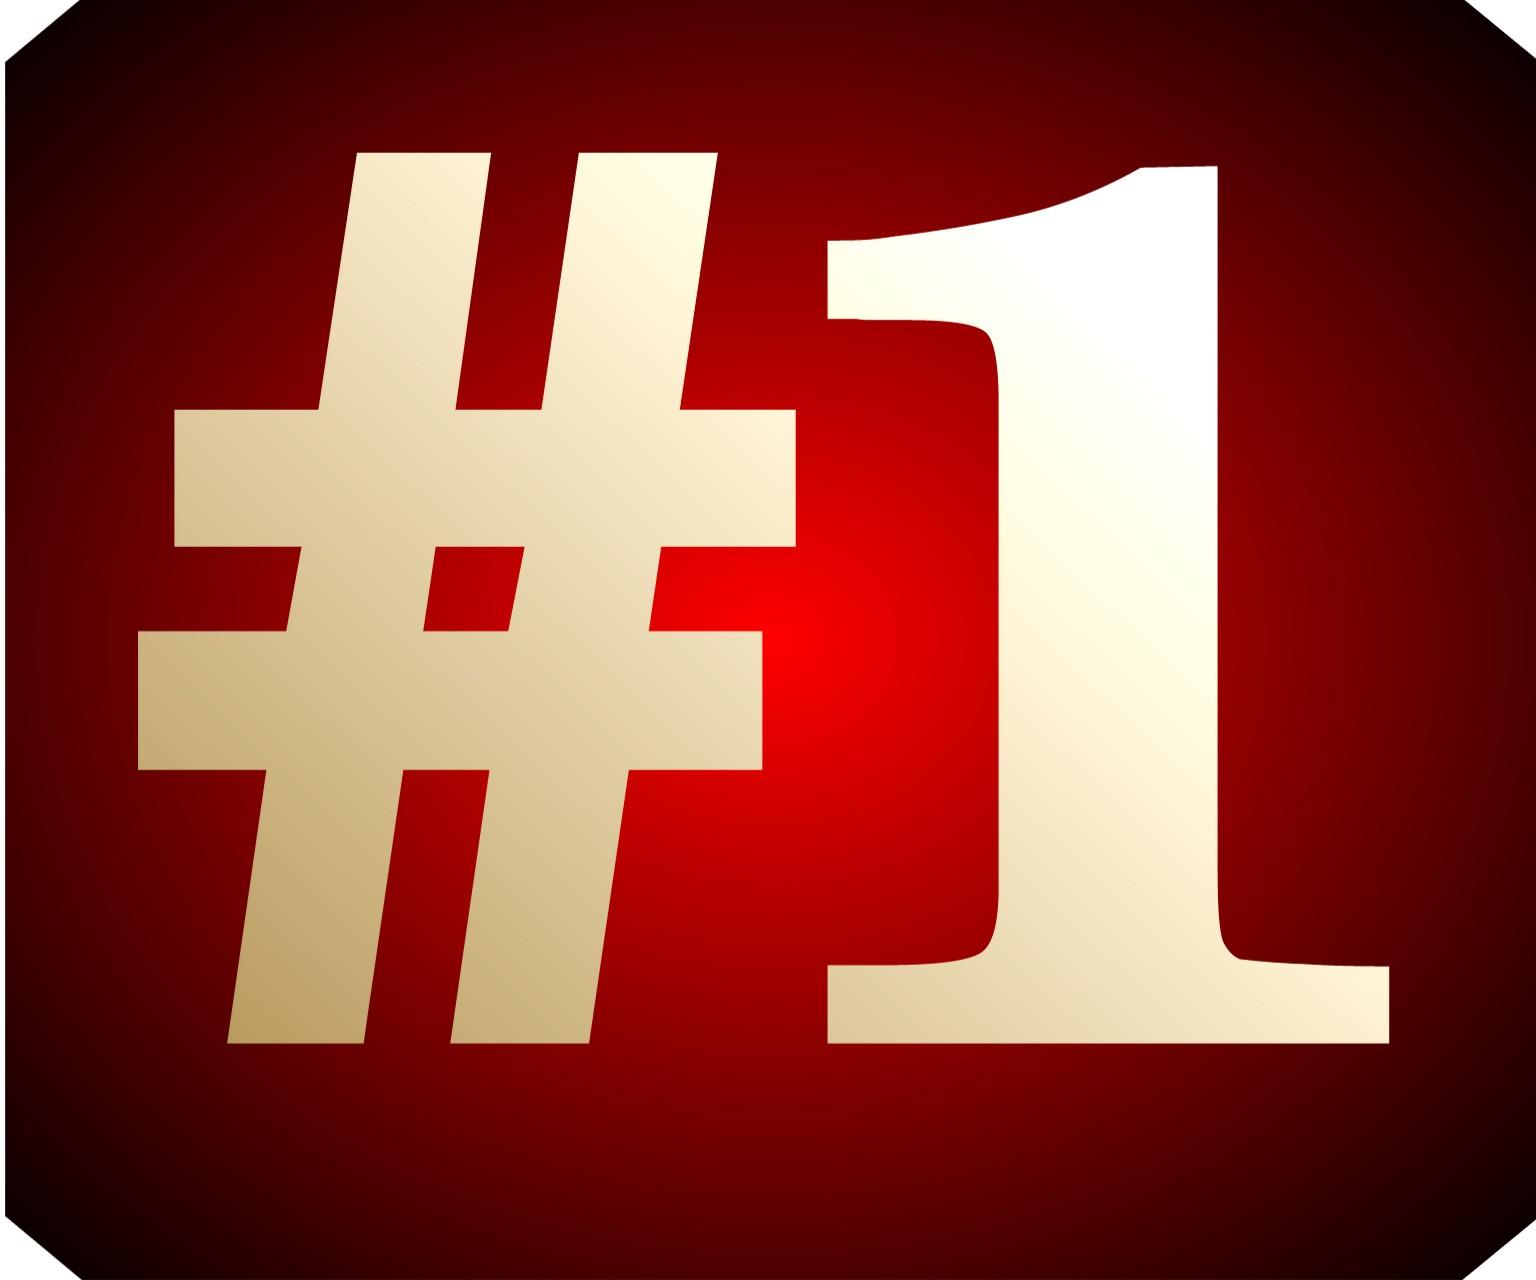 http://2.bp.blogspot.com/-PdVFgREMAIo/TaSOAQfKTAI/AAAAAAAAB_E/rQF0i0Rc3bk/s1600/Number+1.jpg